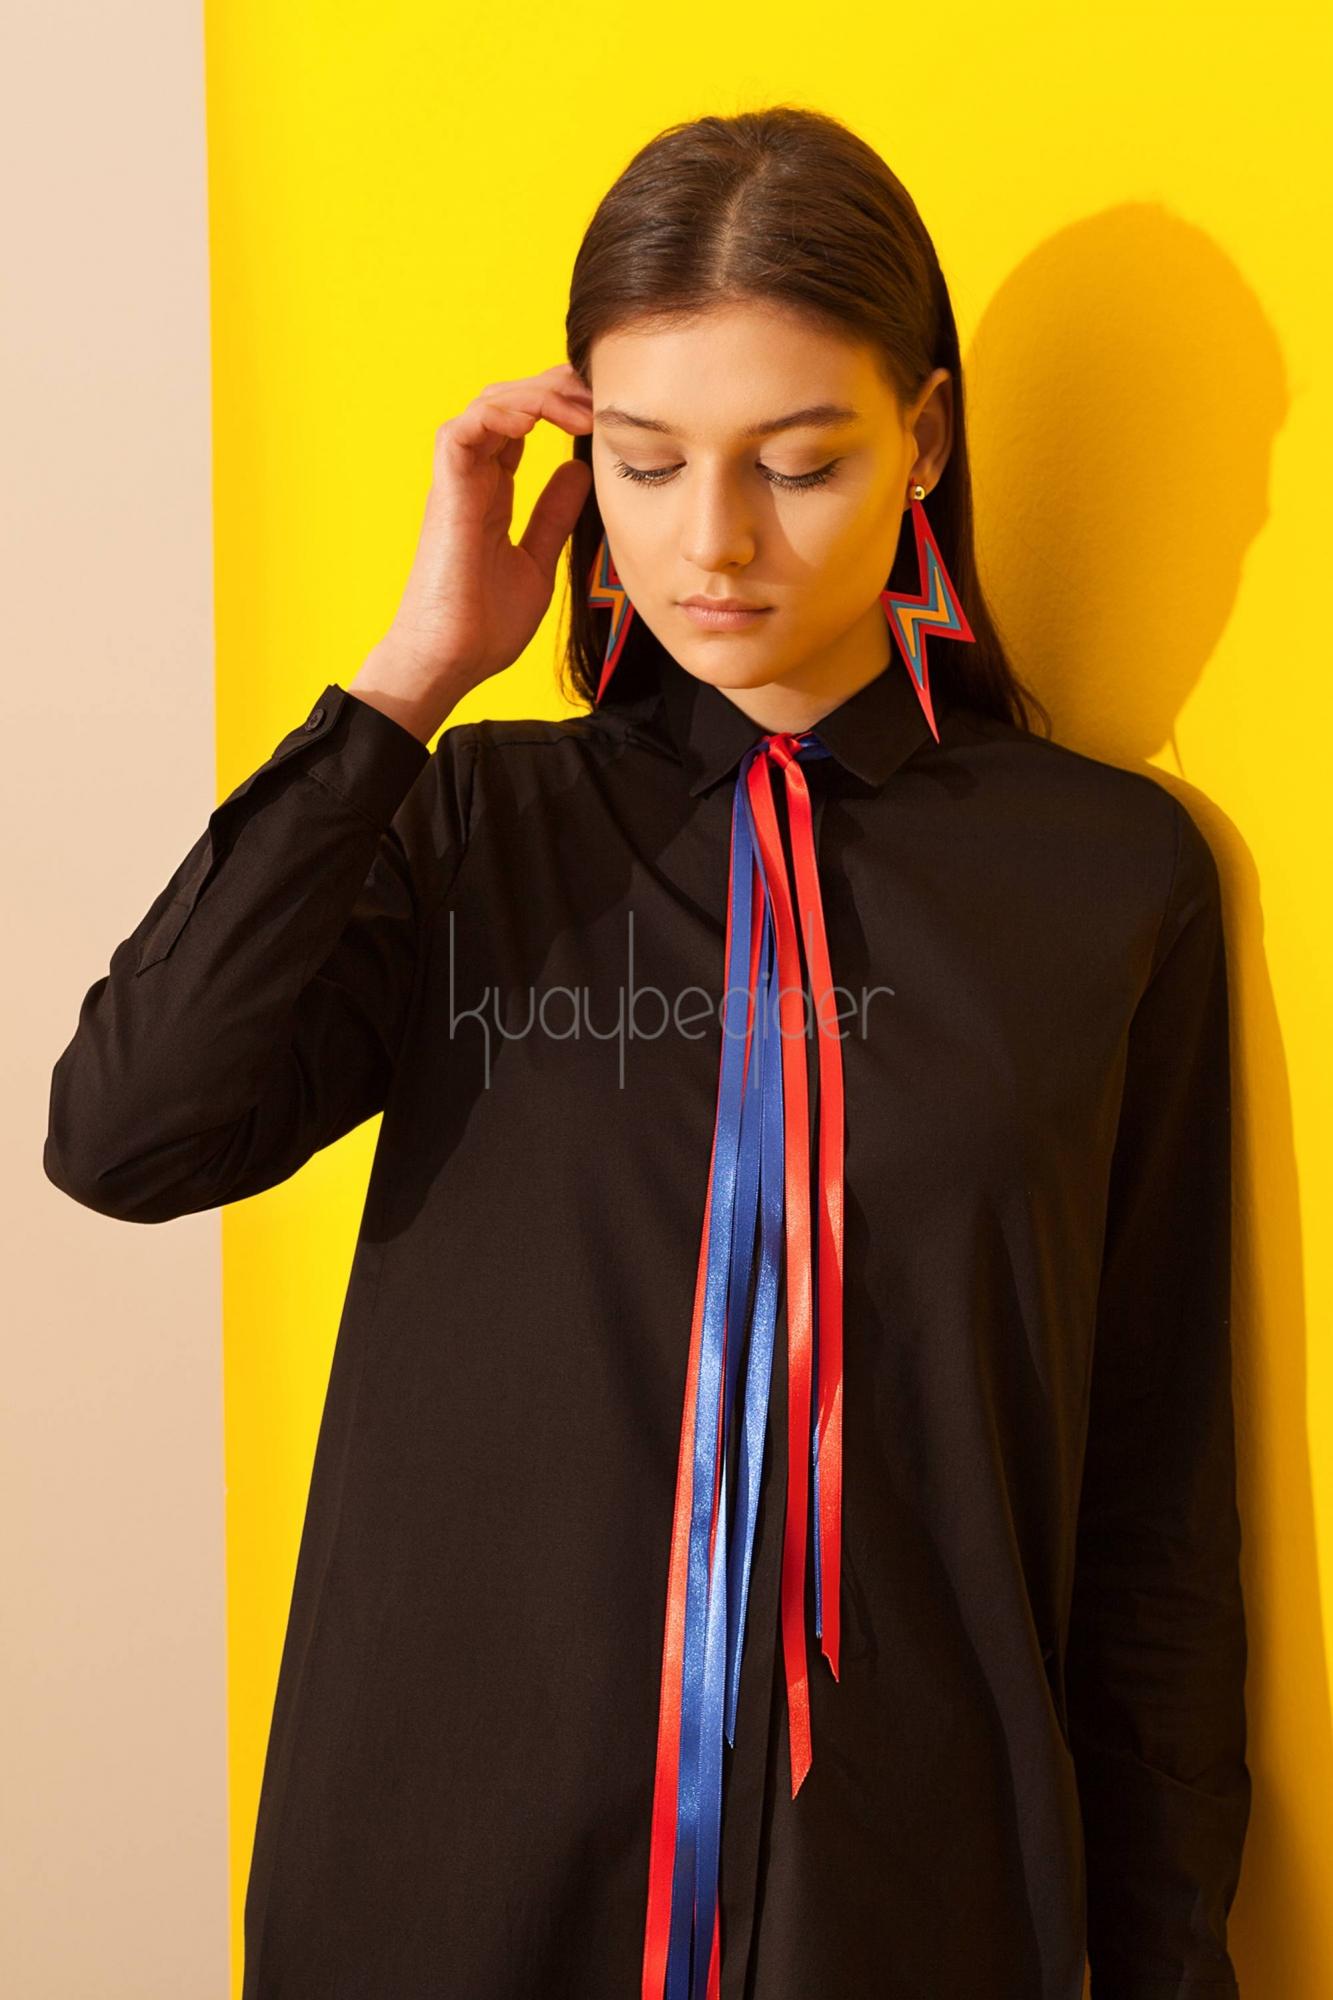 Kuaybe Gider - Siyah Fenomeno Tunik